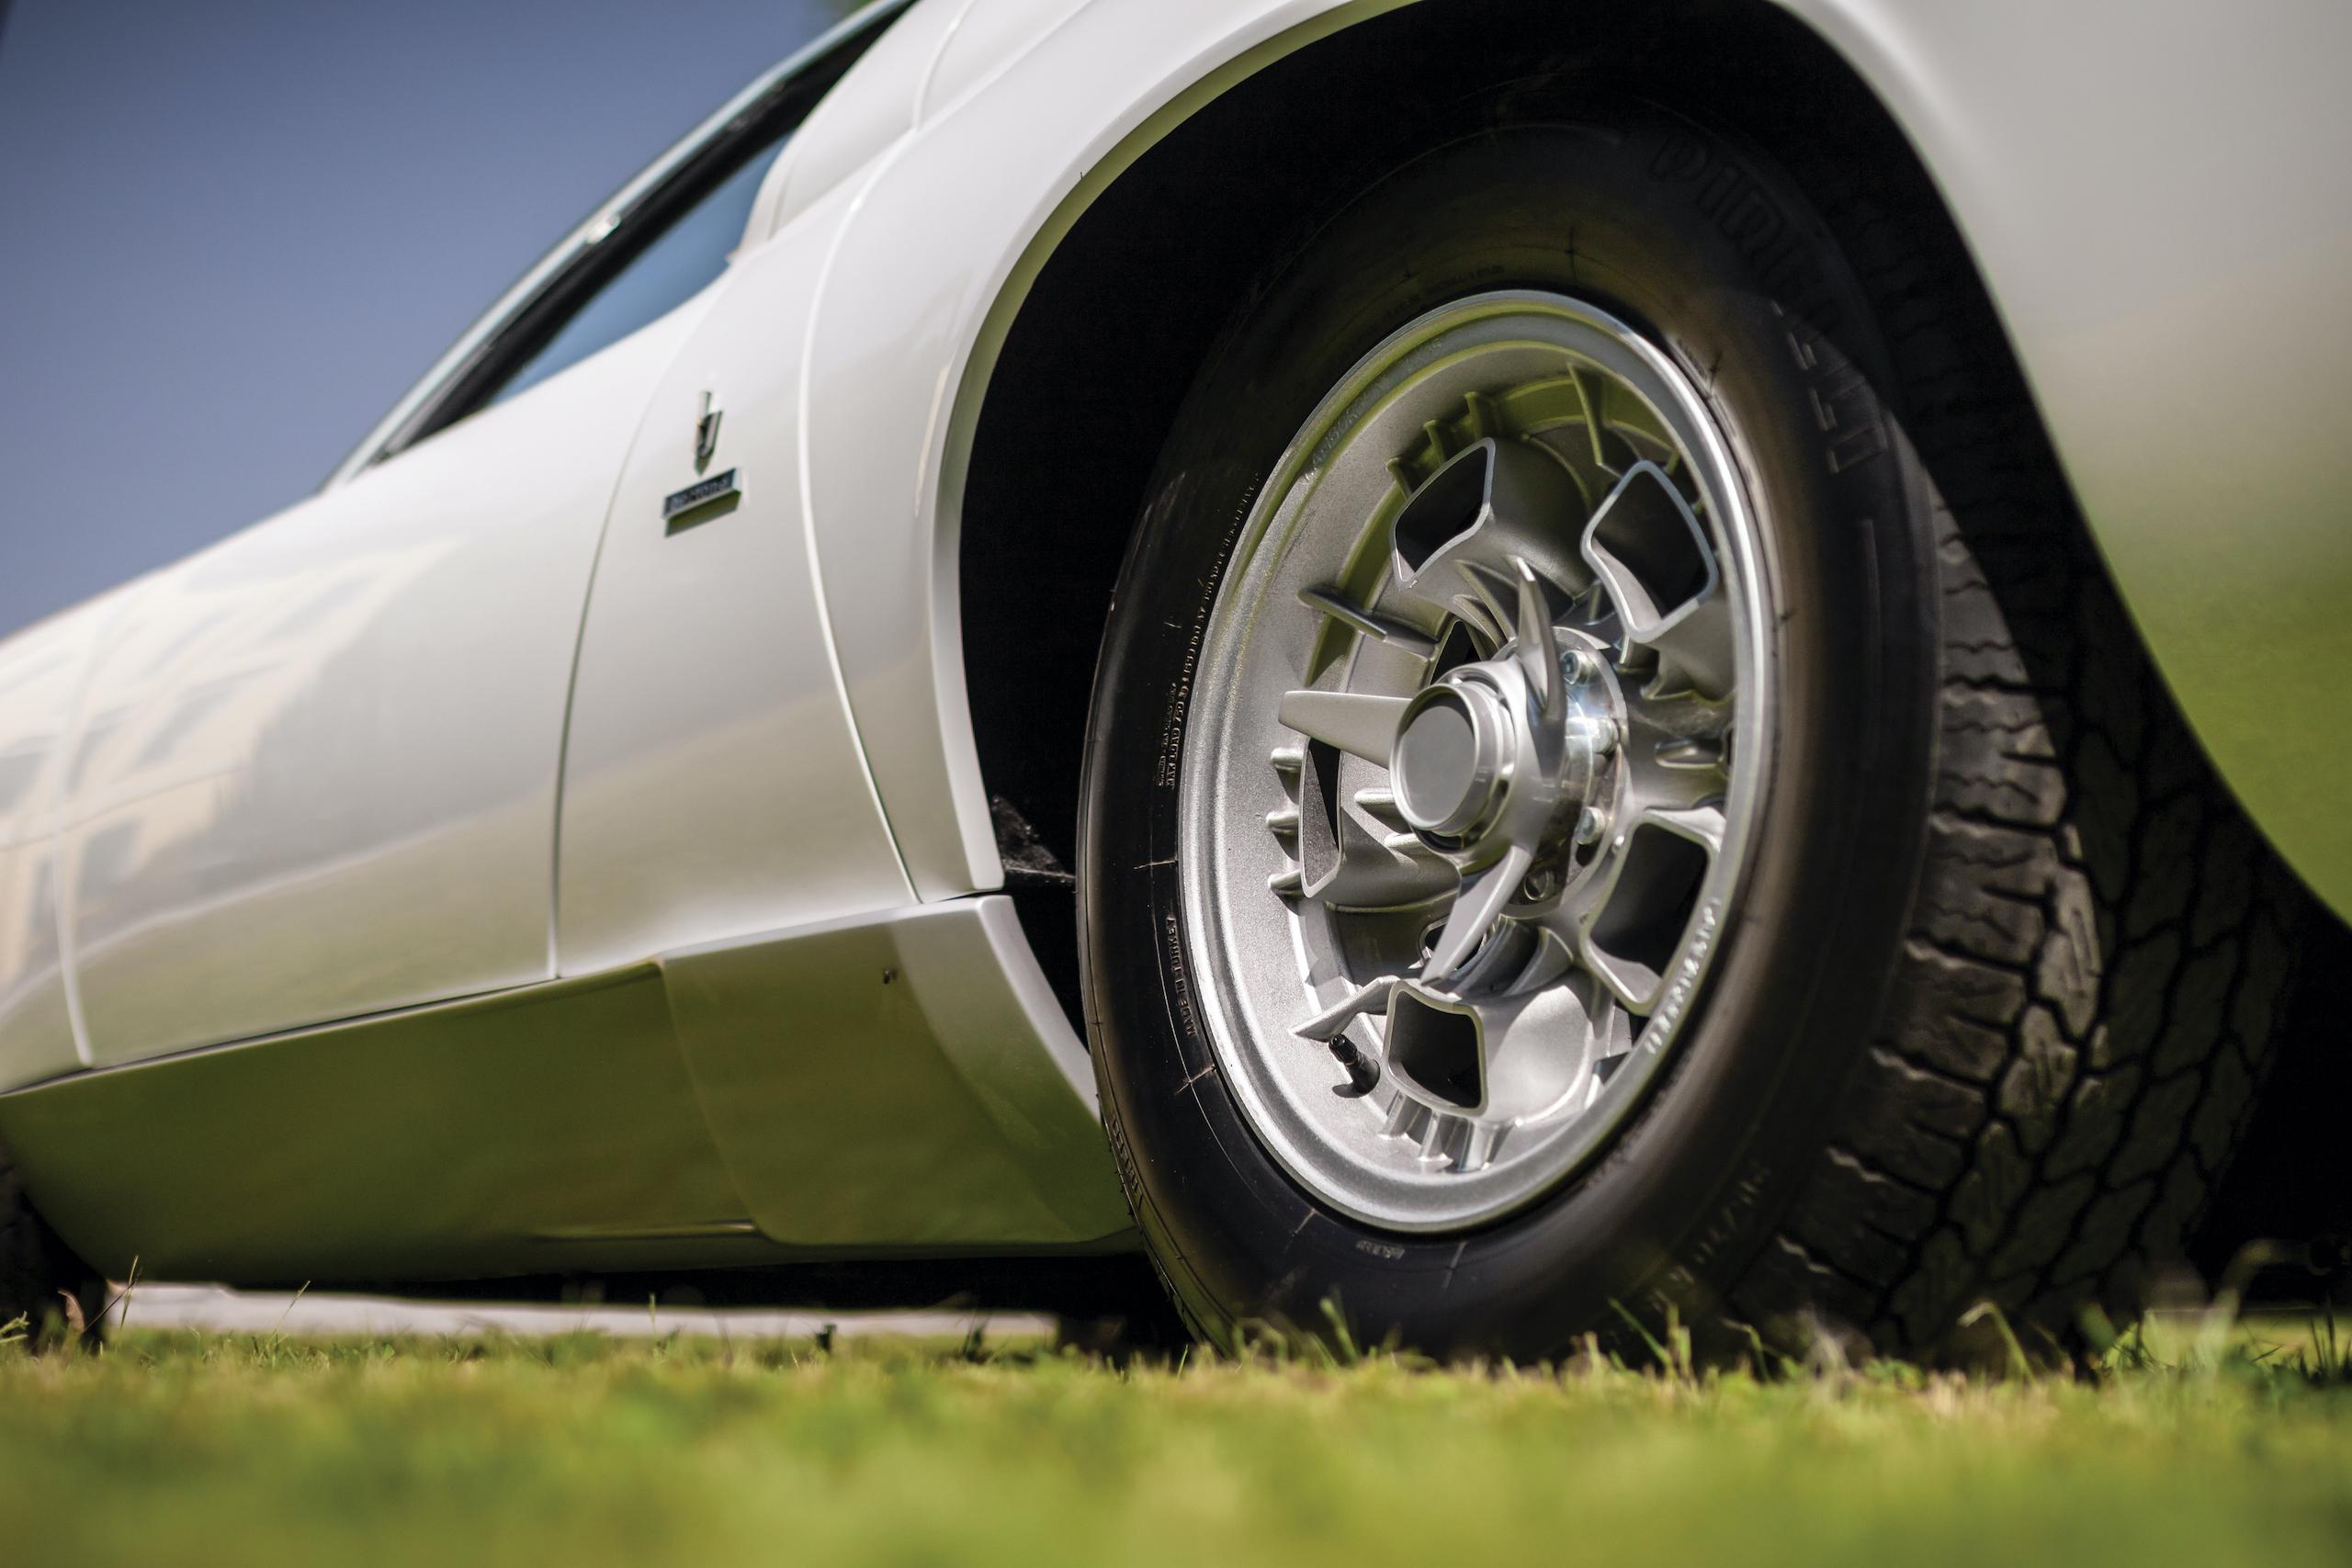 1971 Lamborghini Miura P400 S by Bertone wheel detail